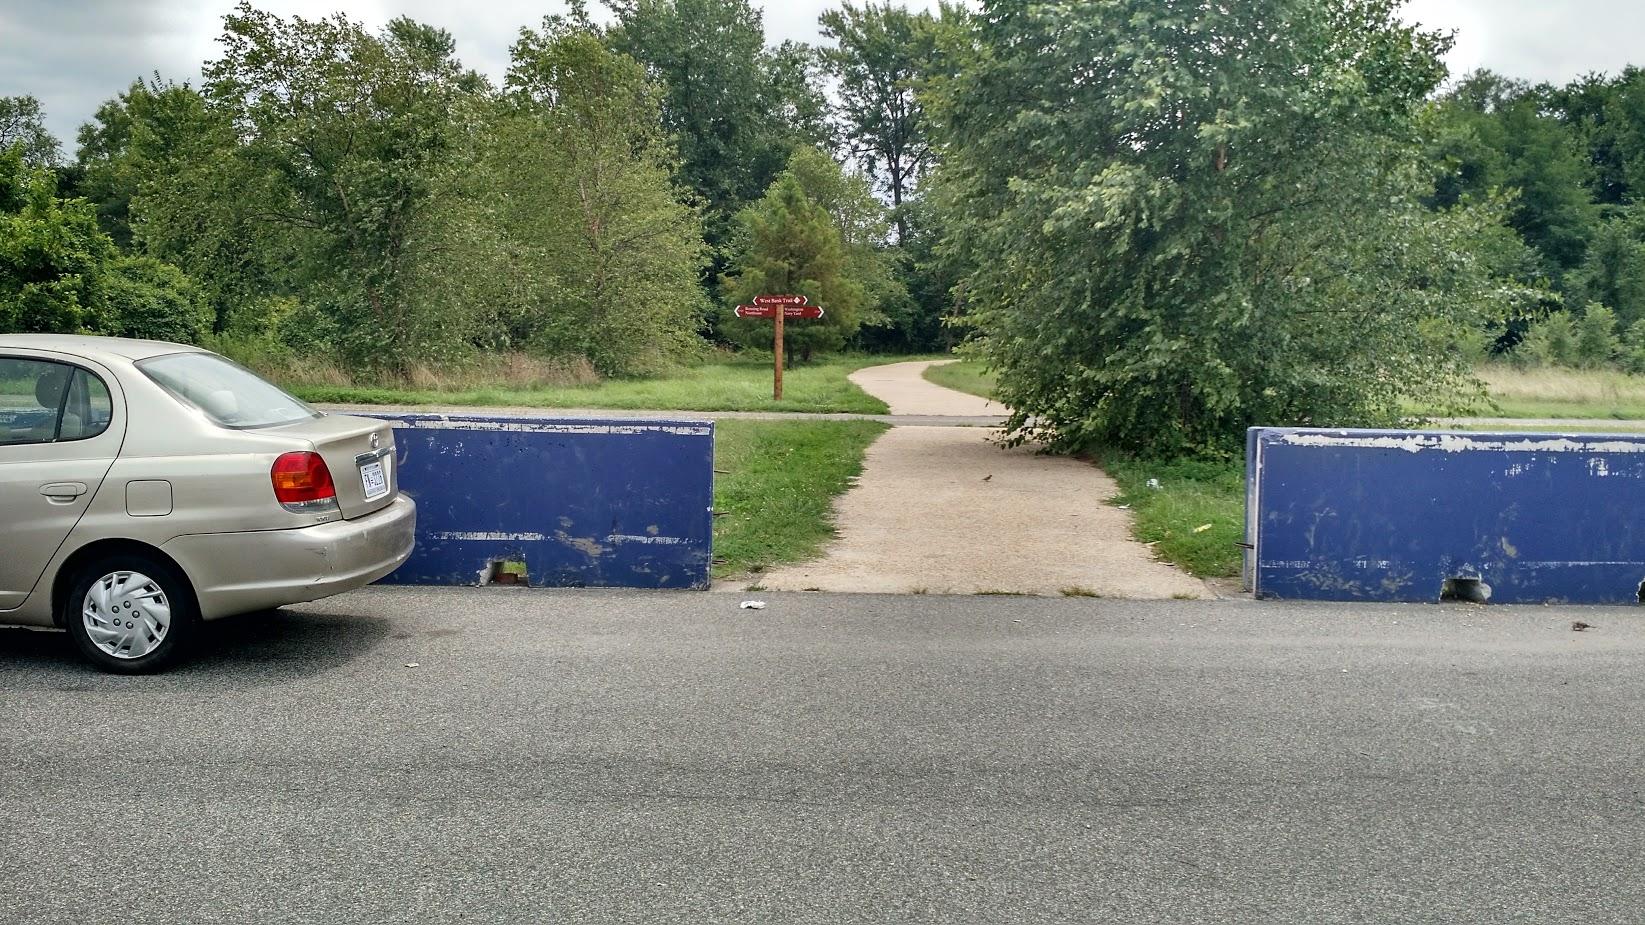 Entrance to Kingman Island from the RFK Stadium parking lots.